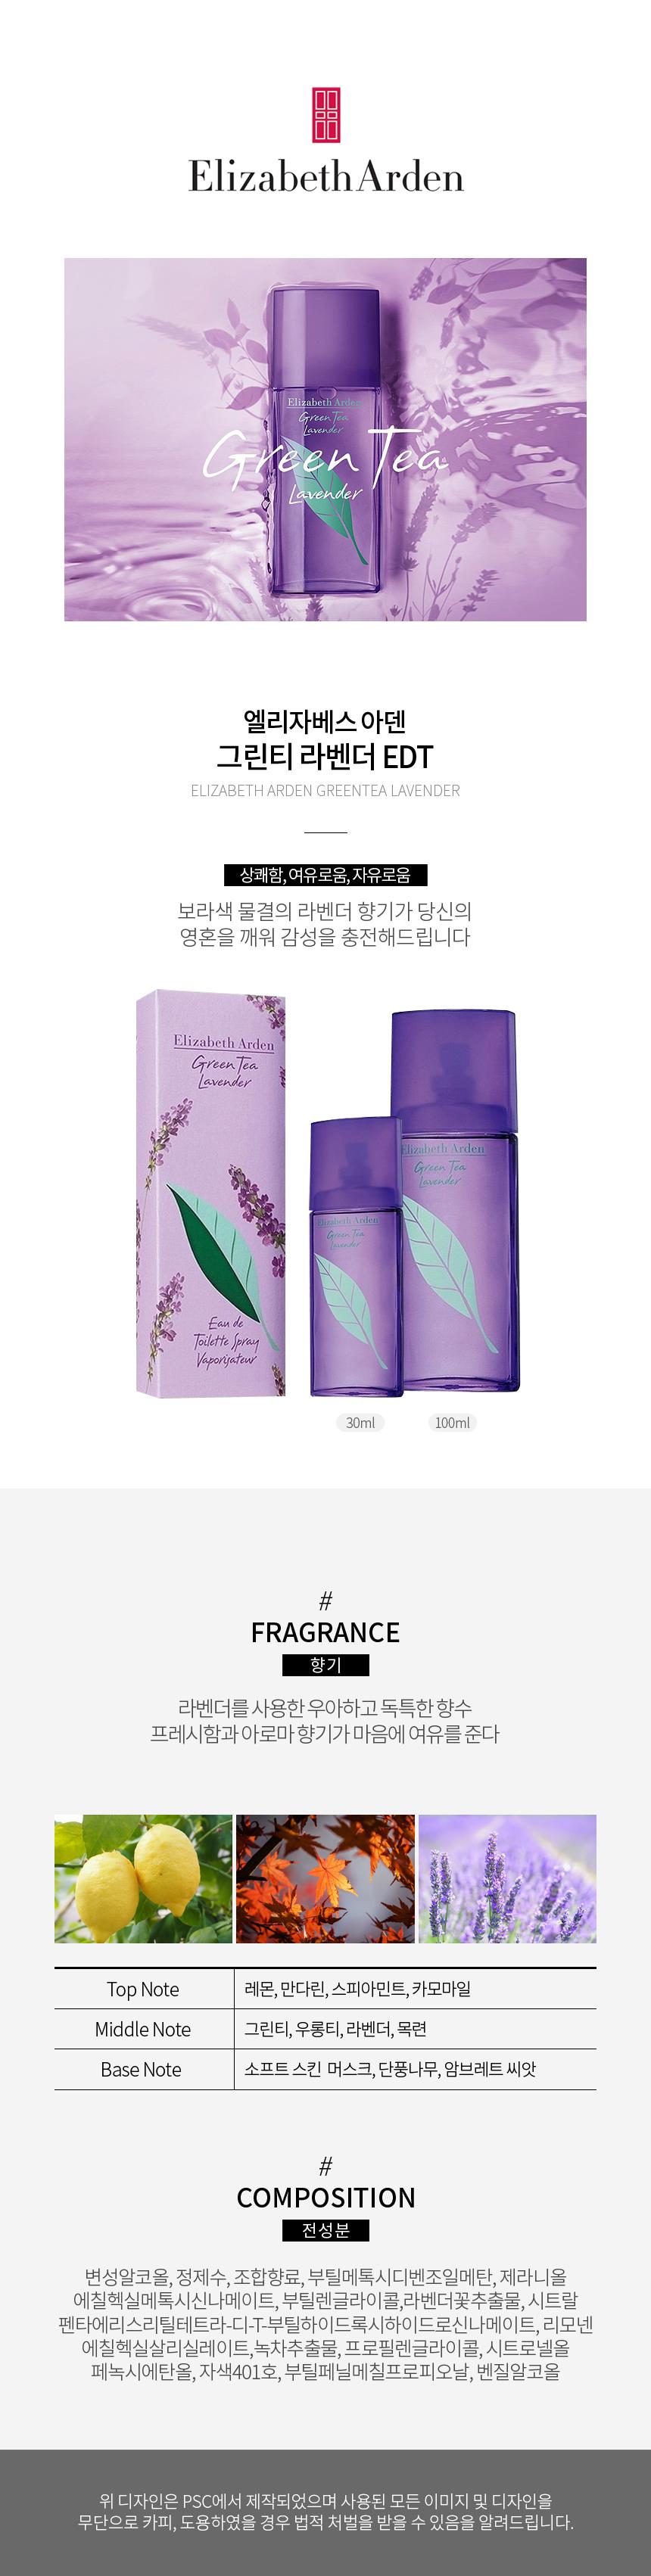 elizabetharden_greentea_lavender_page.jpg